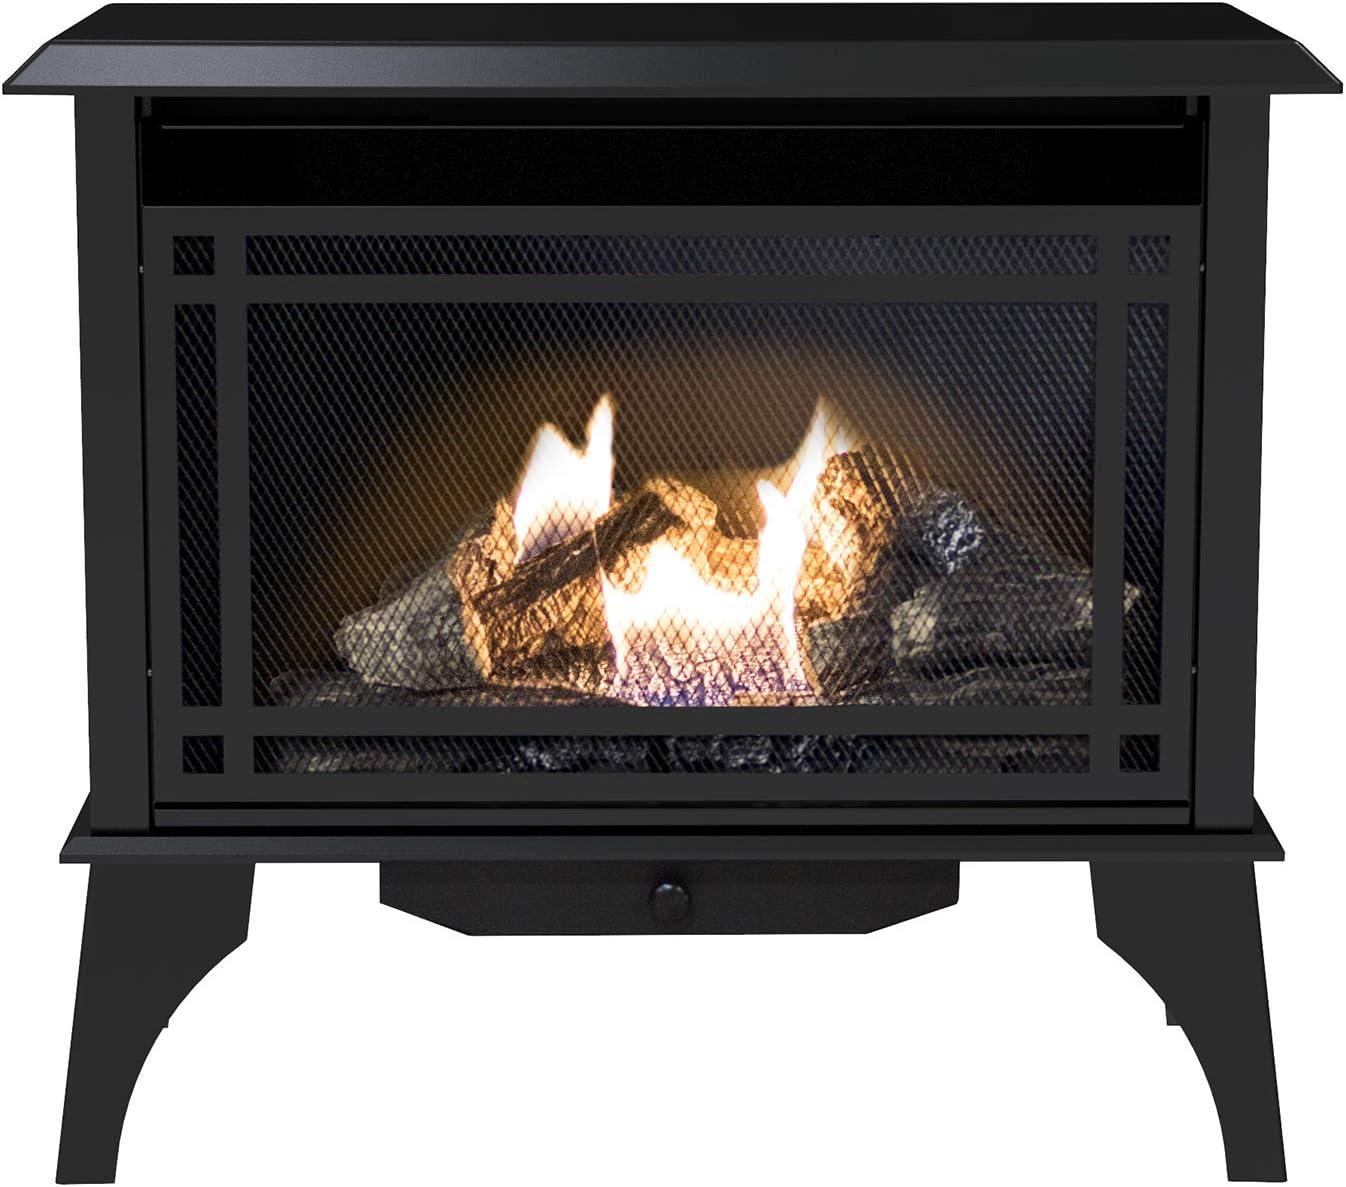 Plesant Hearth VFS2-PH30DT Wood Burning Stove- Best Indoor Wood Burning Stove